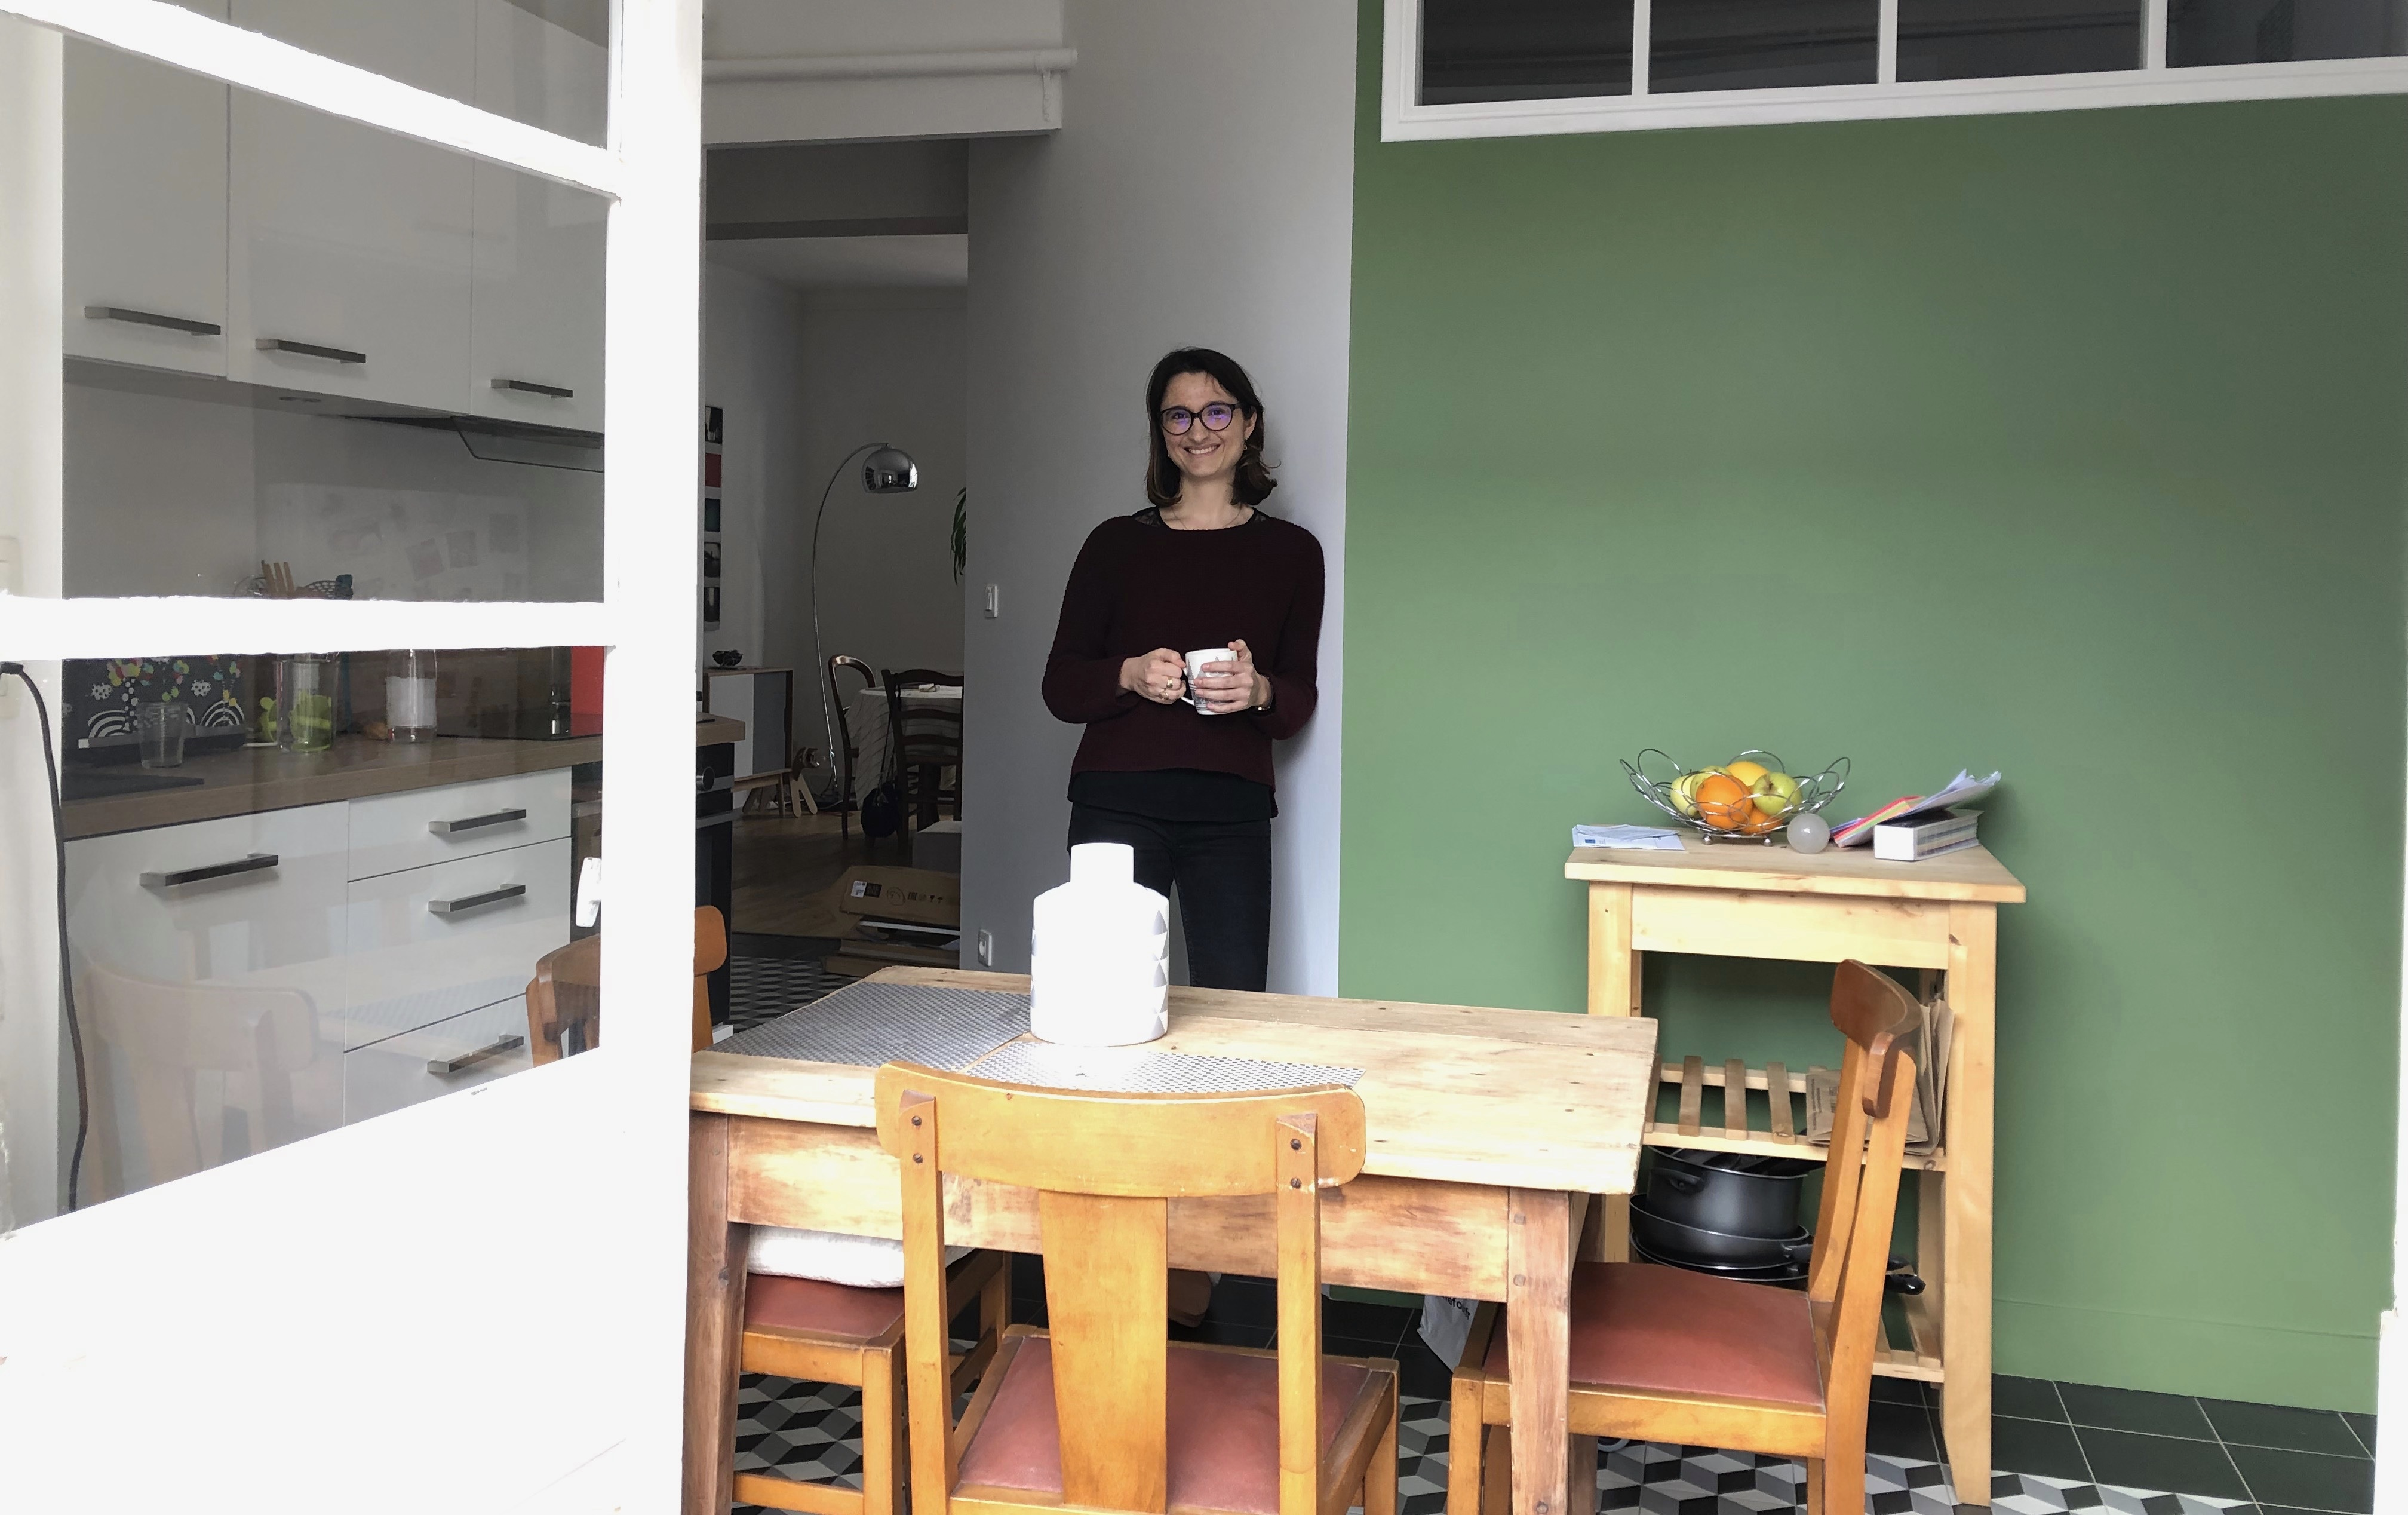 Appartement Constance, Graslin